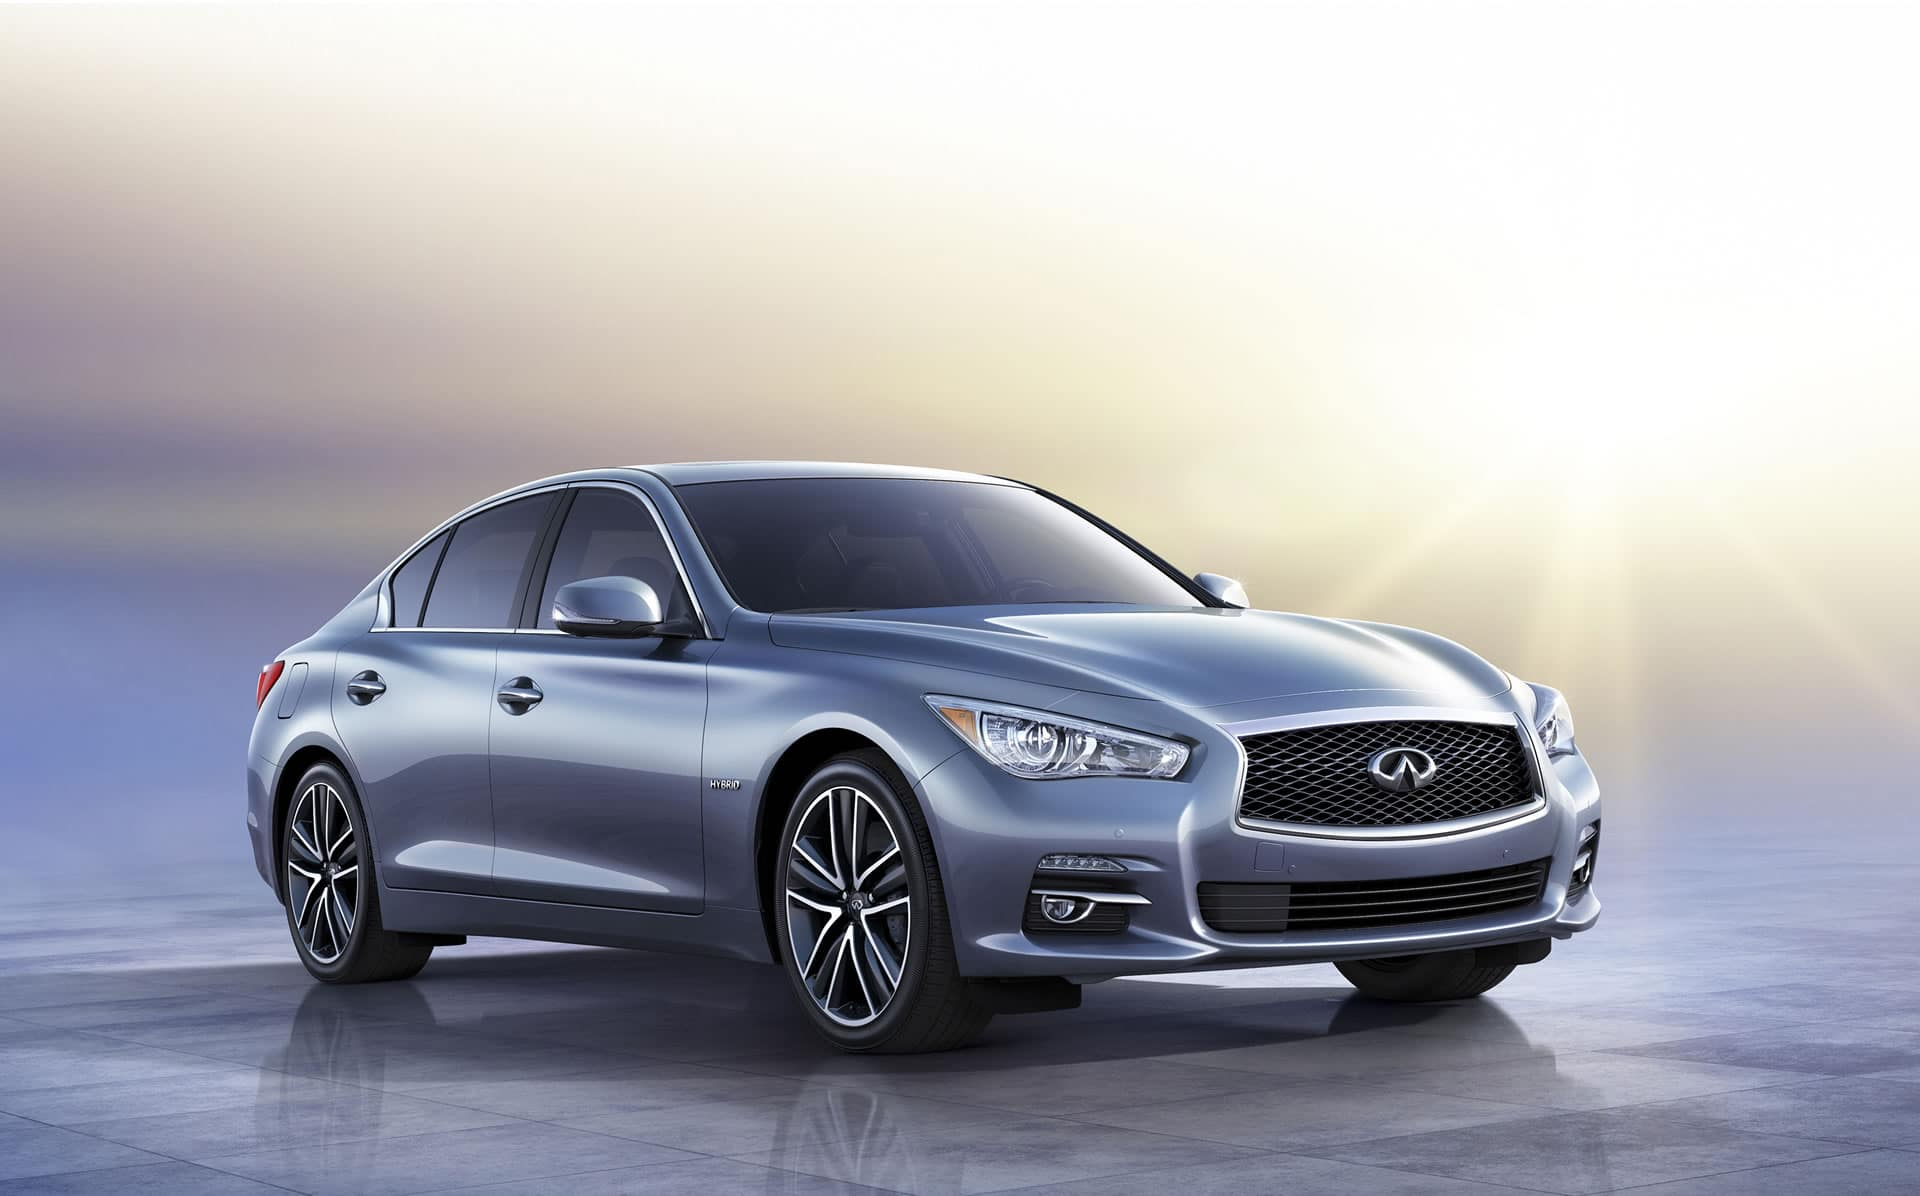 Genfer Autosalon: Nippon-Mittelklasse Infiniti Q50 feiert Europadebüt